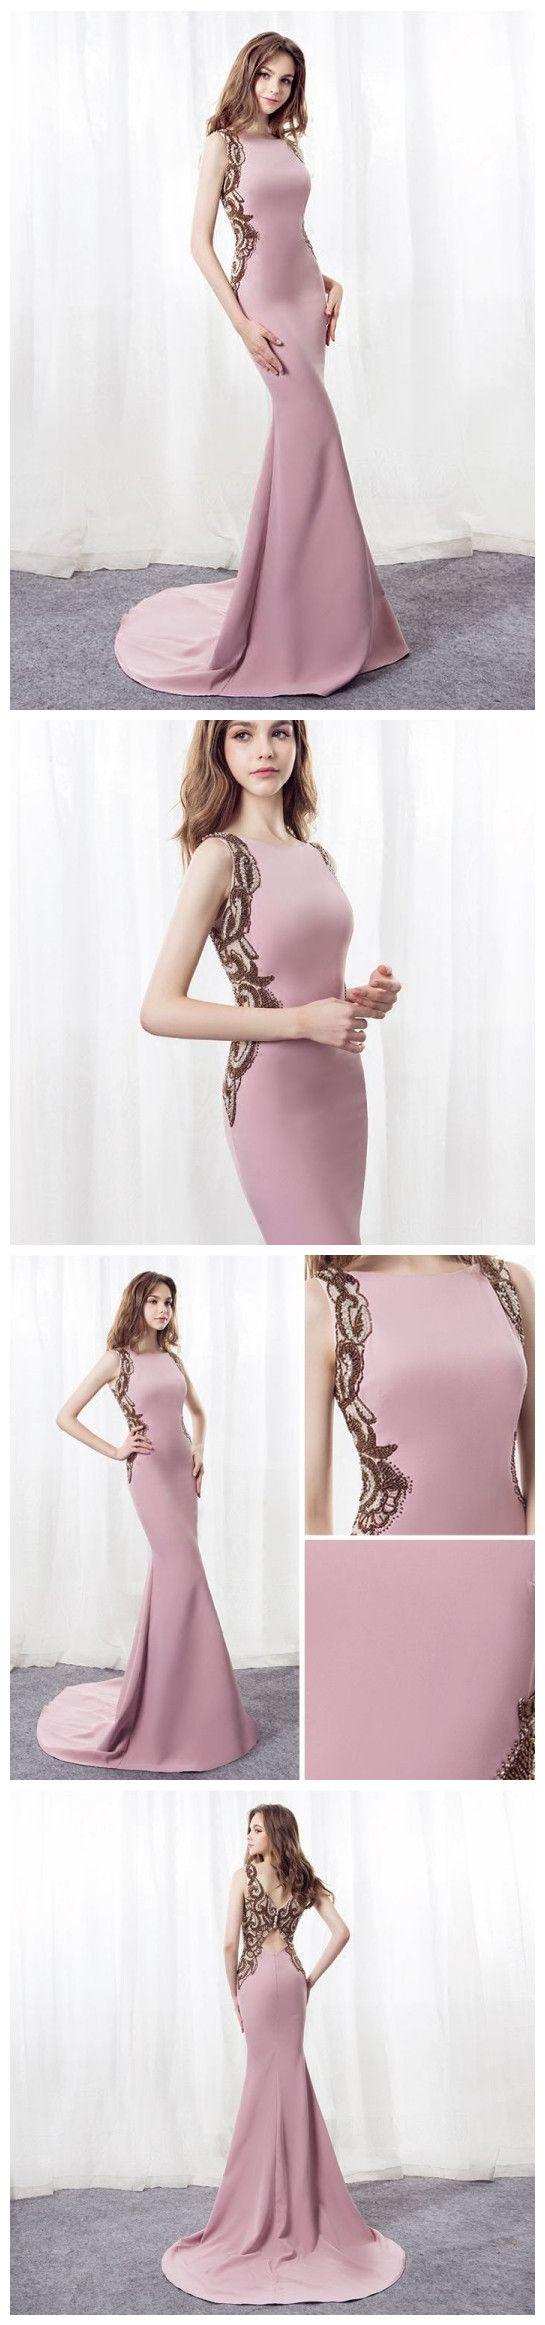 Mermaid prom dresses pink sweepbrush train bateau long prom dress